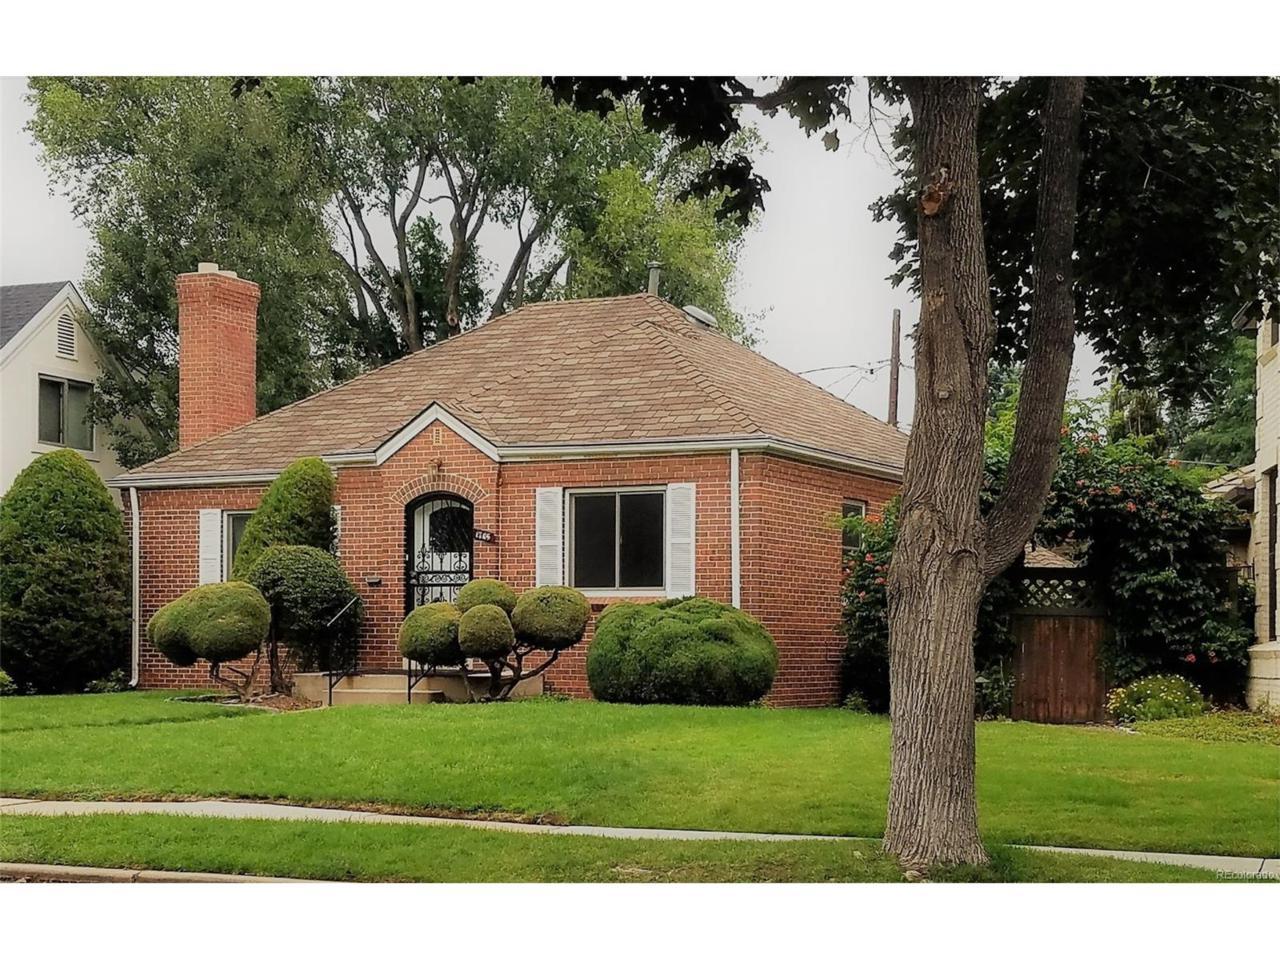 1035 S Fillmore Way, Denver, CO 80209 (MLS #8763799) :: 8z Real Estate